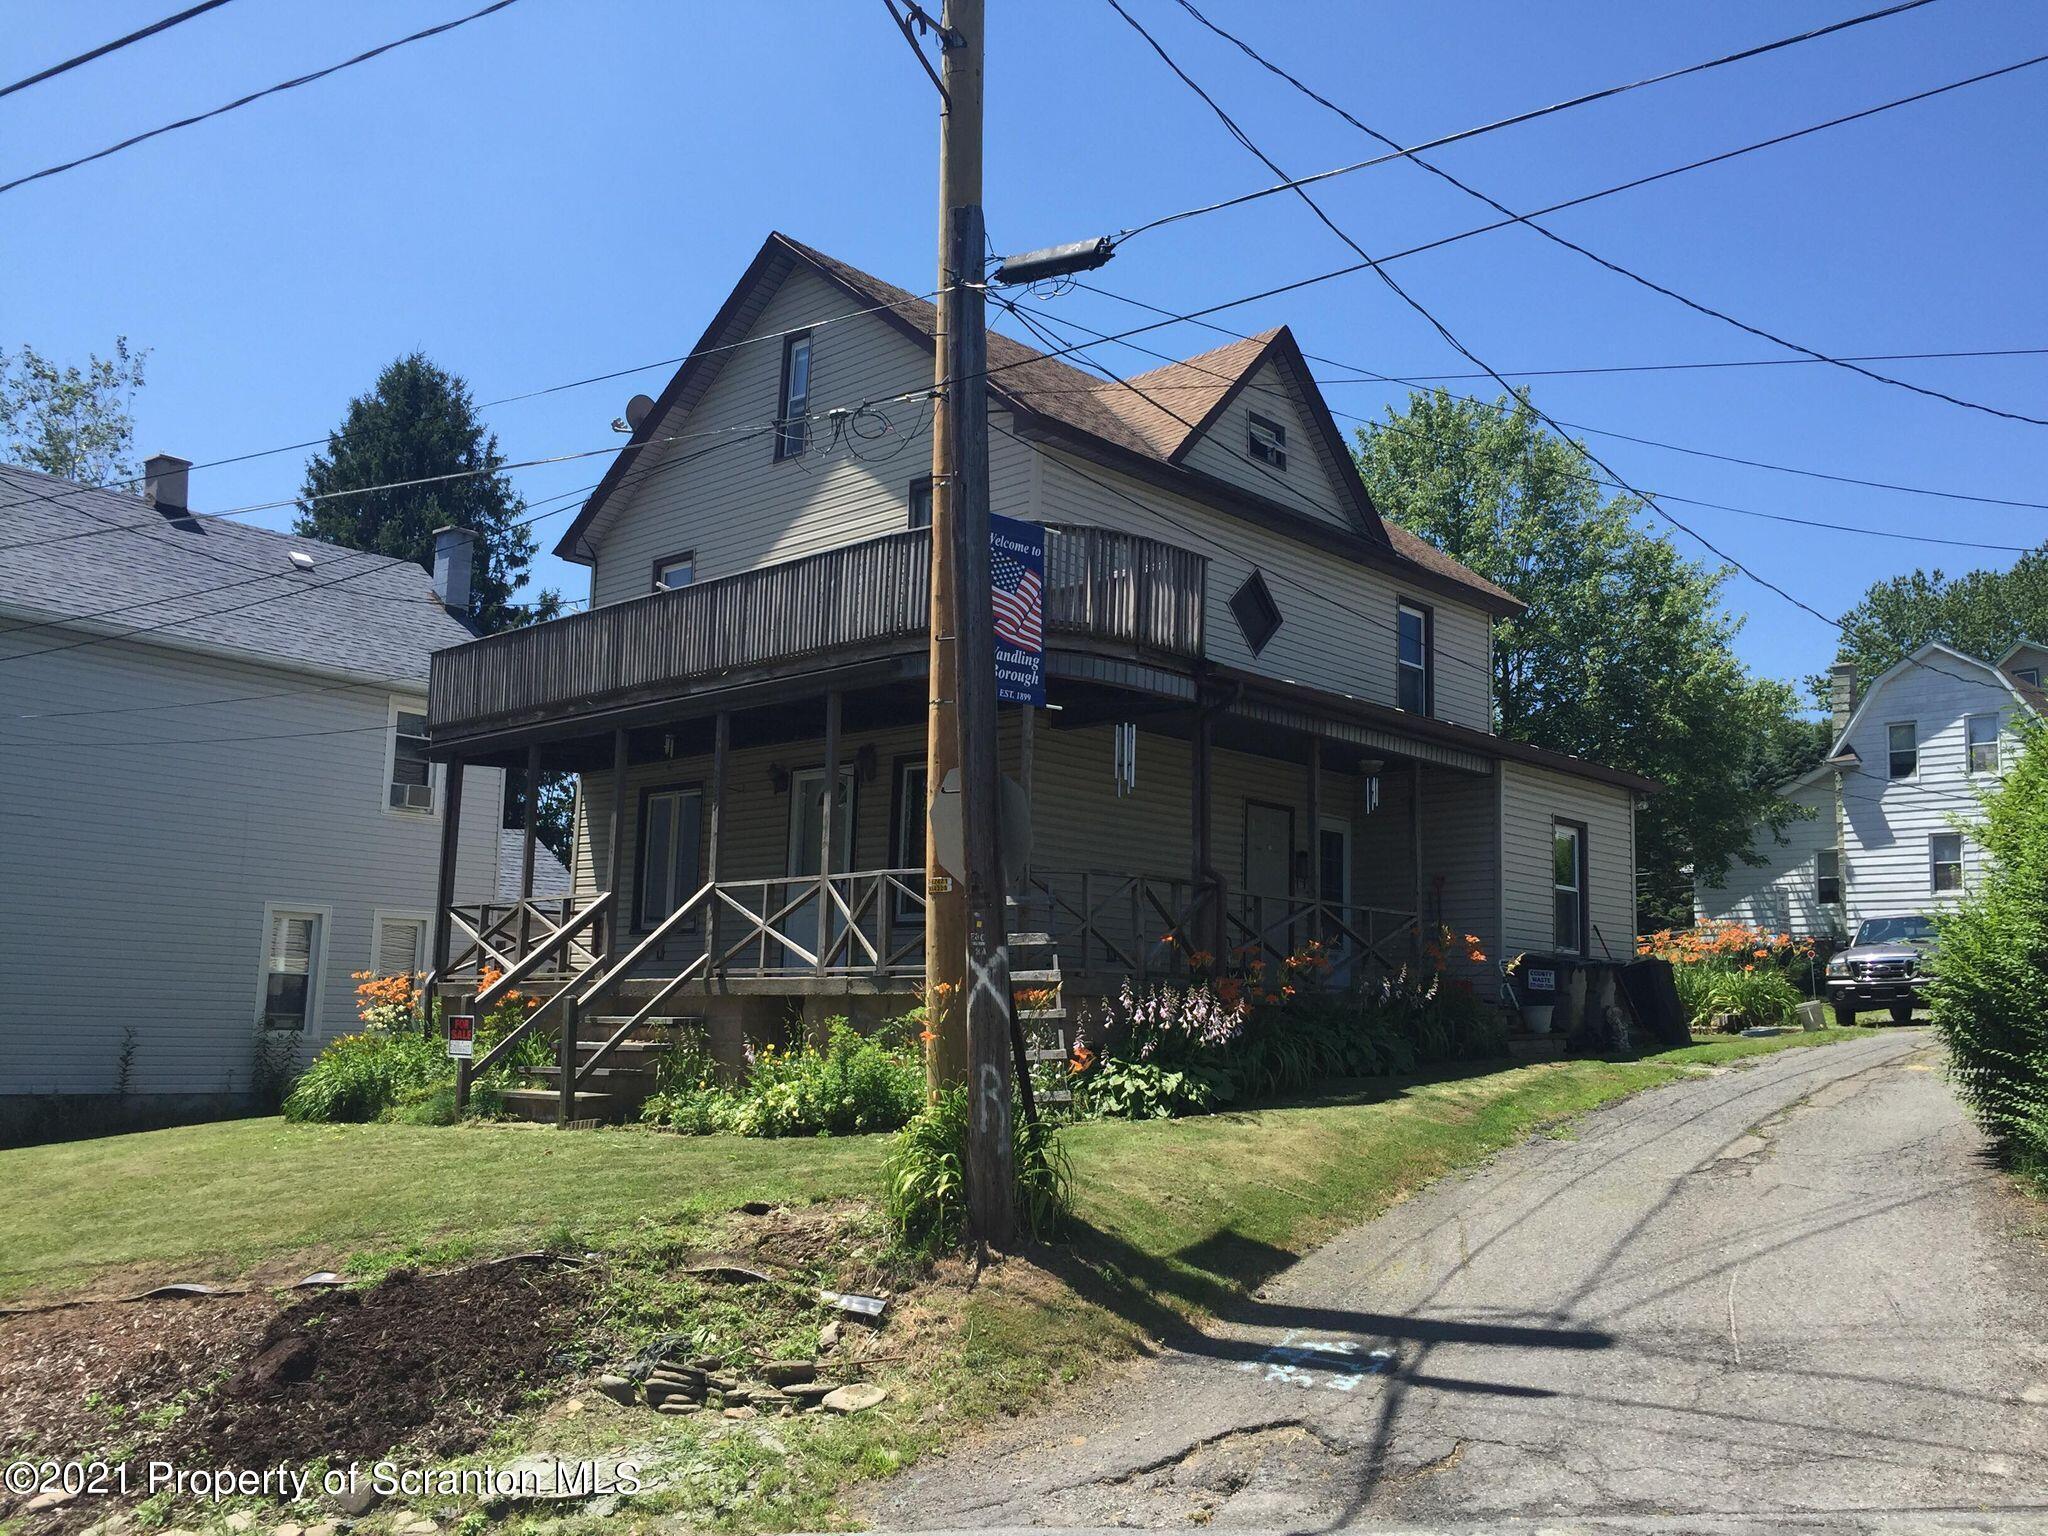 629 Clinton St, Forest City, Pennsylvania 18421, 3 Bedrooms Bedrooms, 2 Rooms Rooms,2 BathroomsBathrooms,Single Family,For Sale,Clinton,21-2214